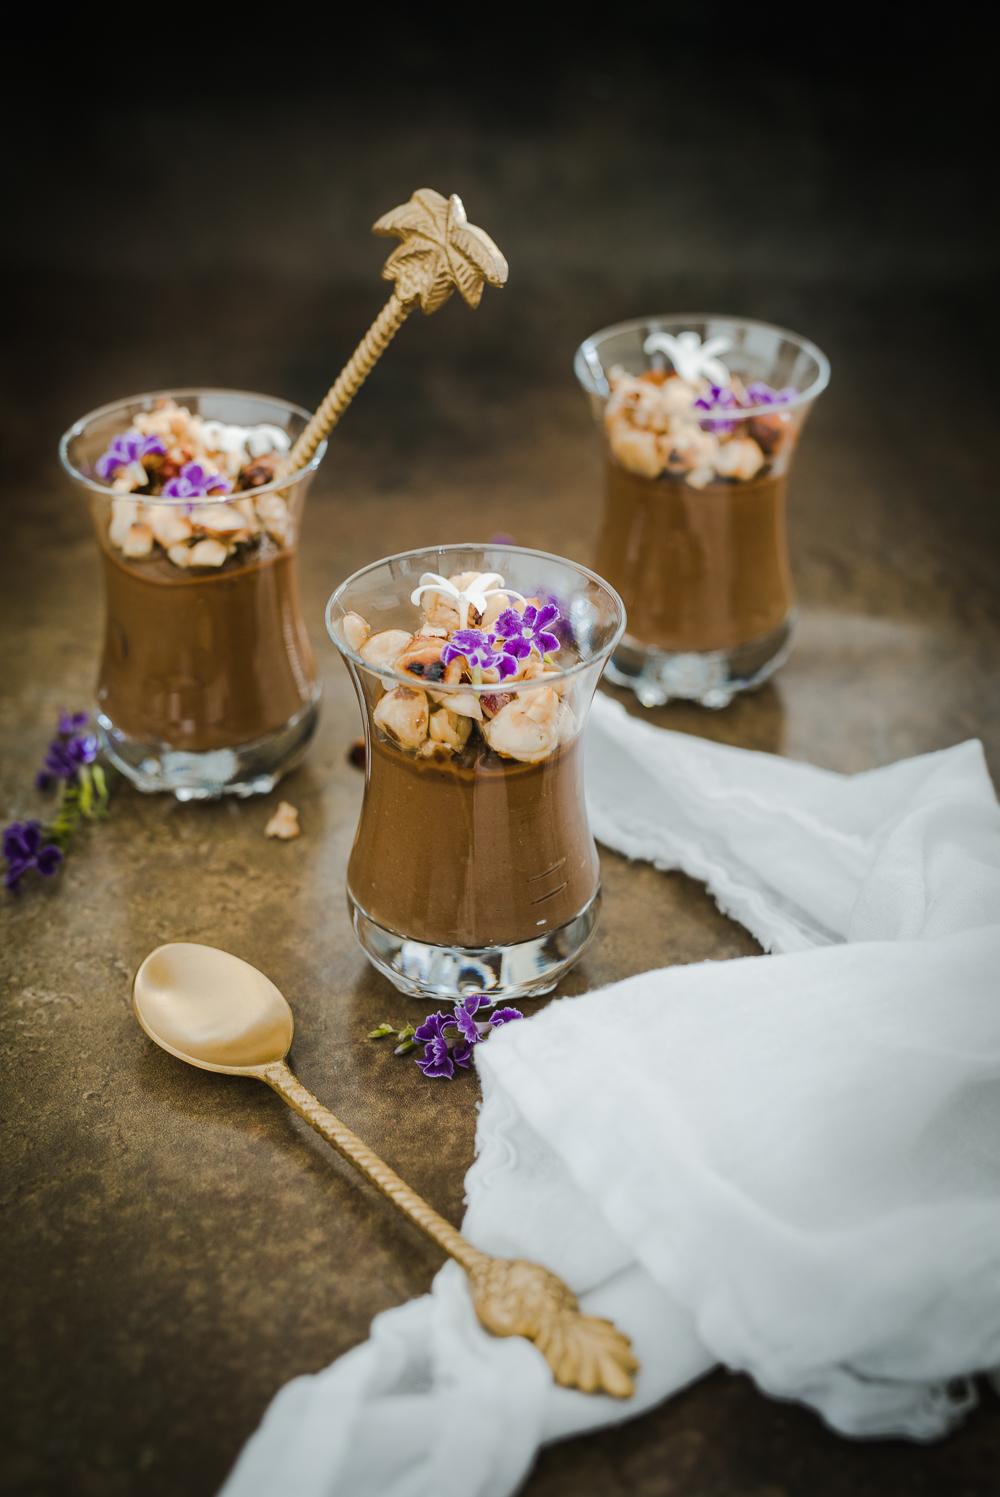 Chokladmousse-apelsinblomvatten-recept-rawfood-grontvarjedag.jpg